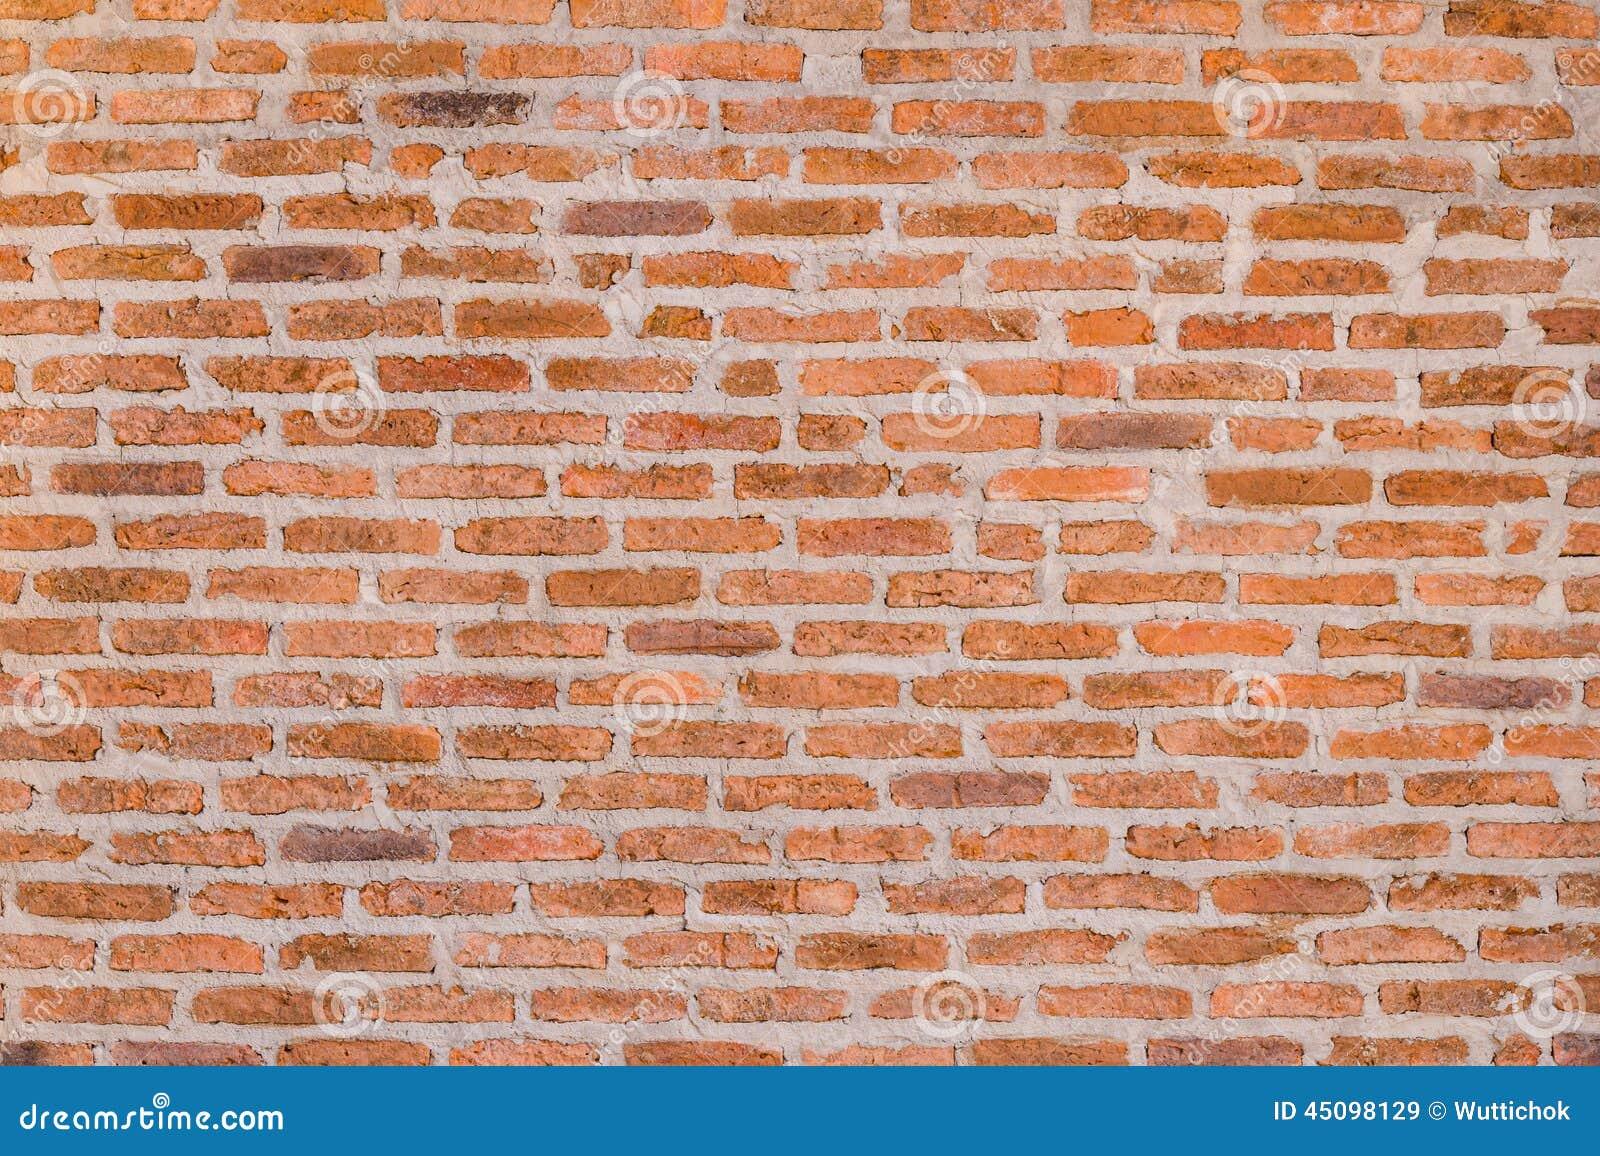 Decorative Brick Walls : Decorative red brick wall texture stock image of